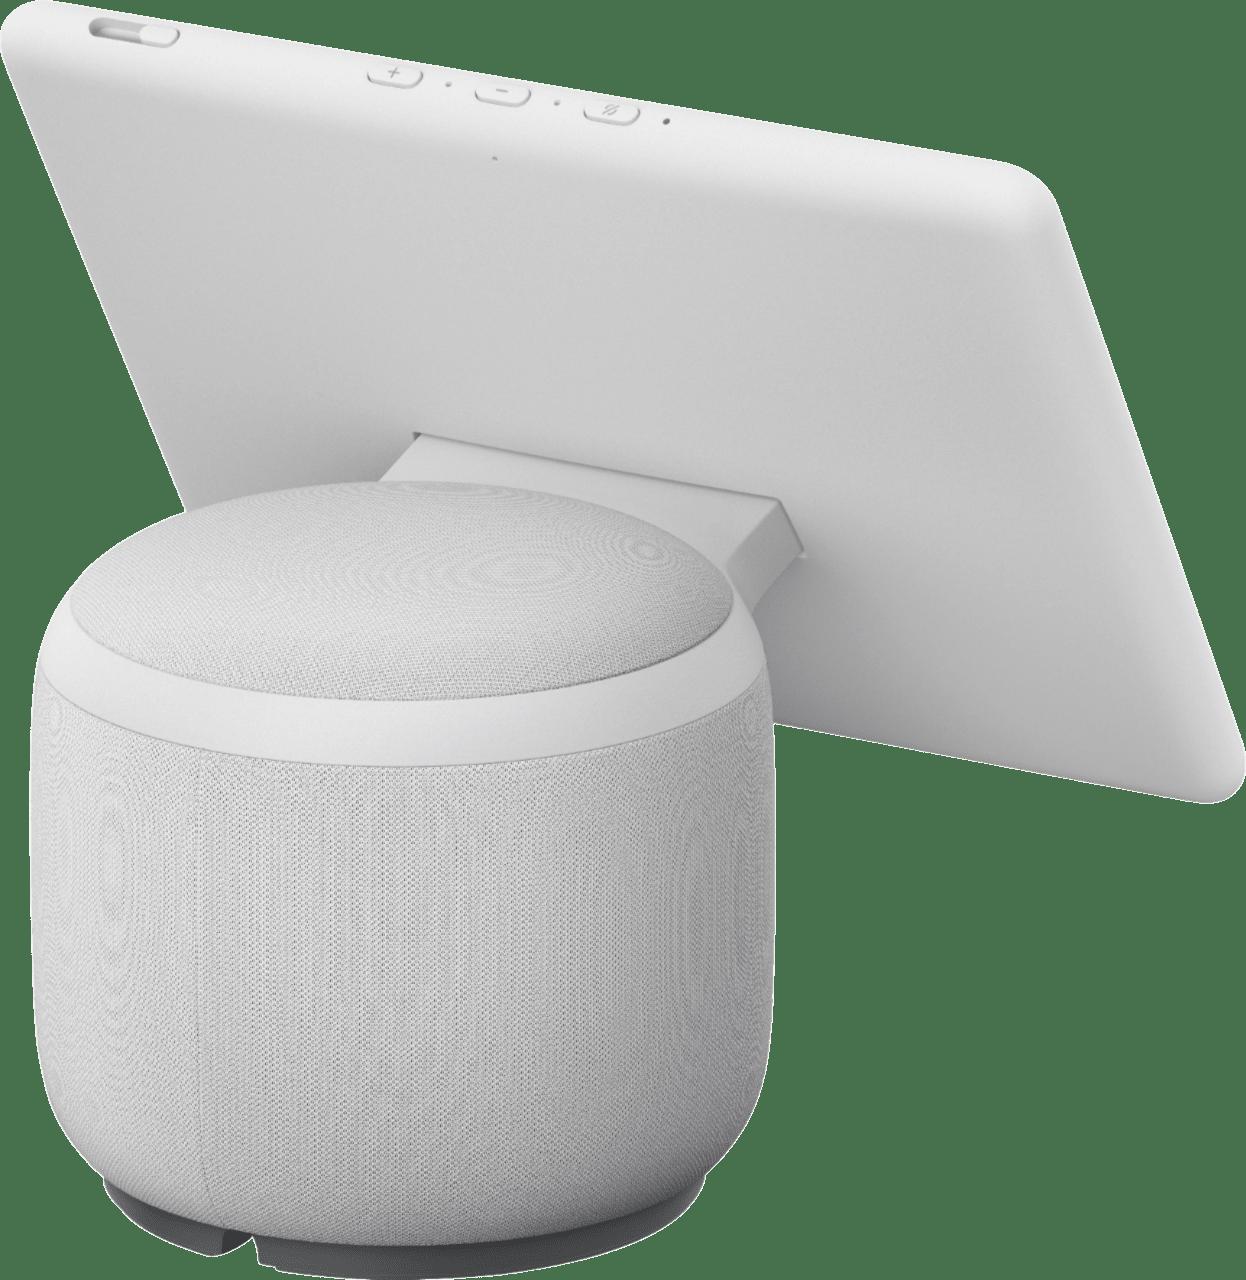 White Amazon Echo Show 10 (3rd Gen).3